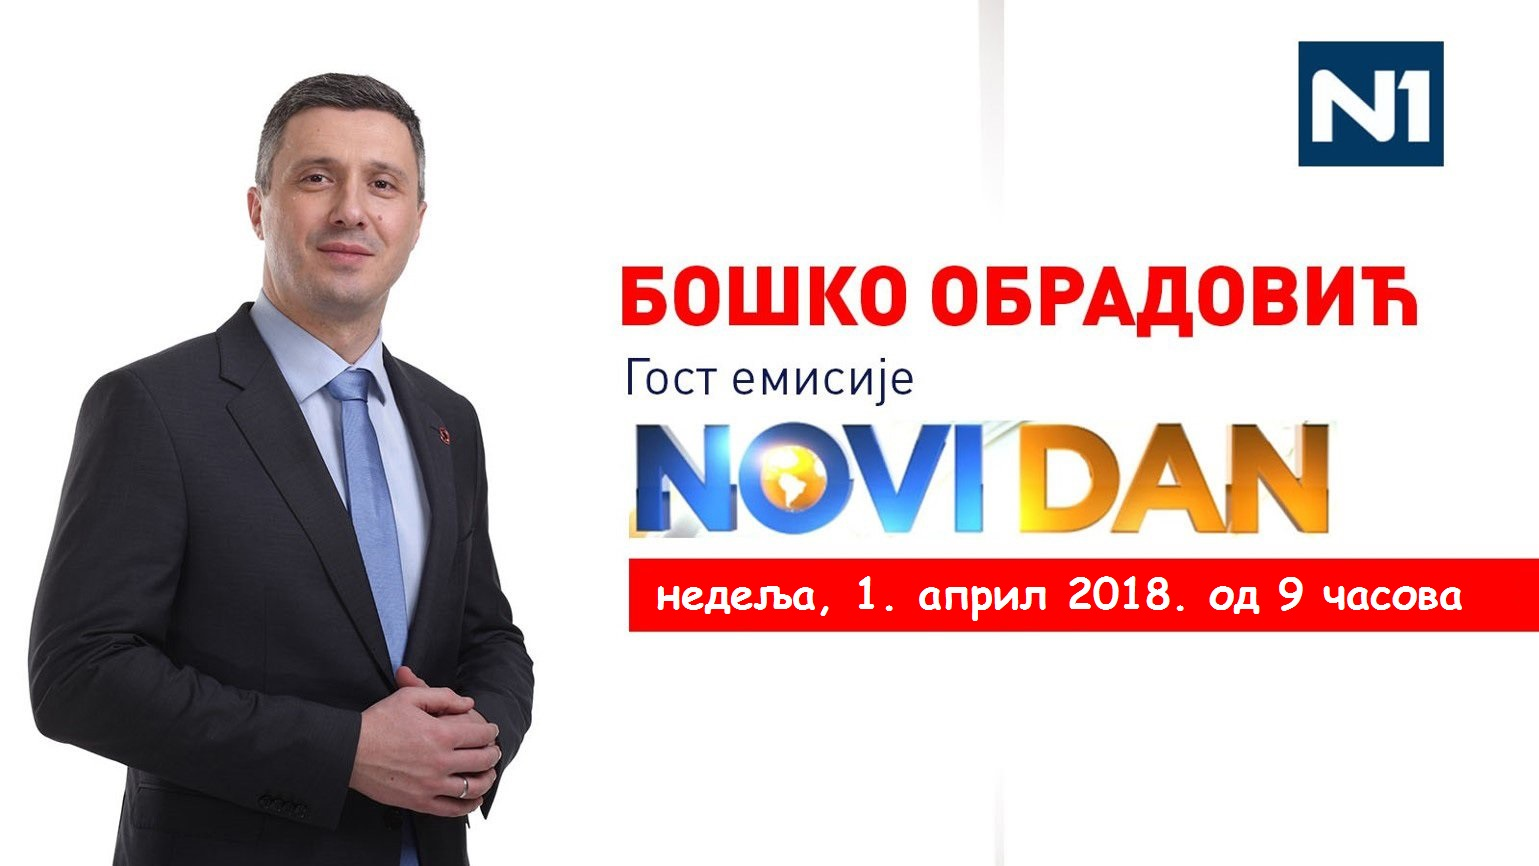 Boško Obradović gost Novog dana na TV N1, nedelja, 1. april 2018. od 9 časova